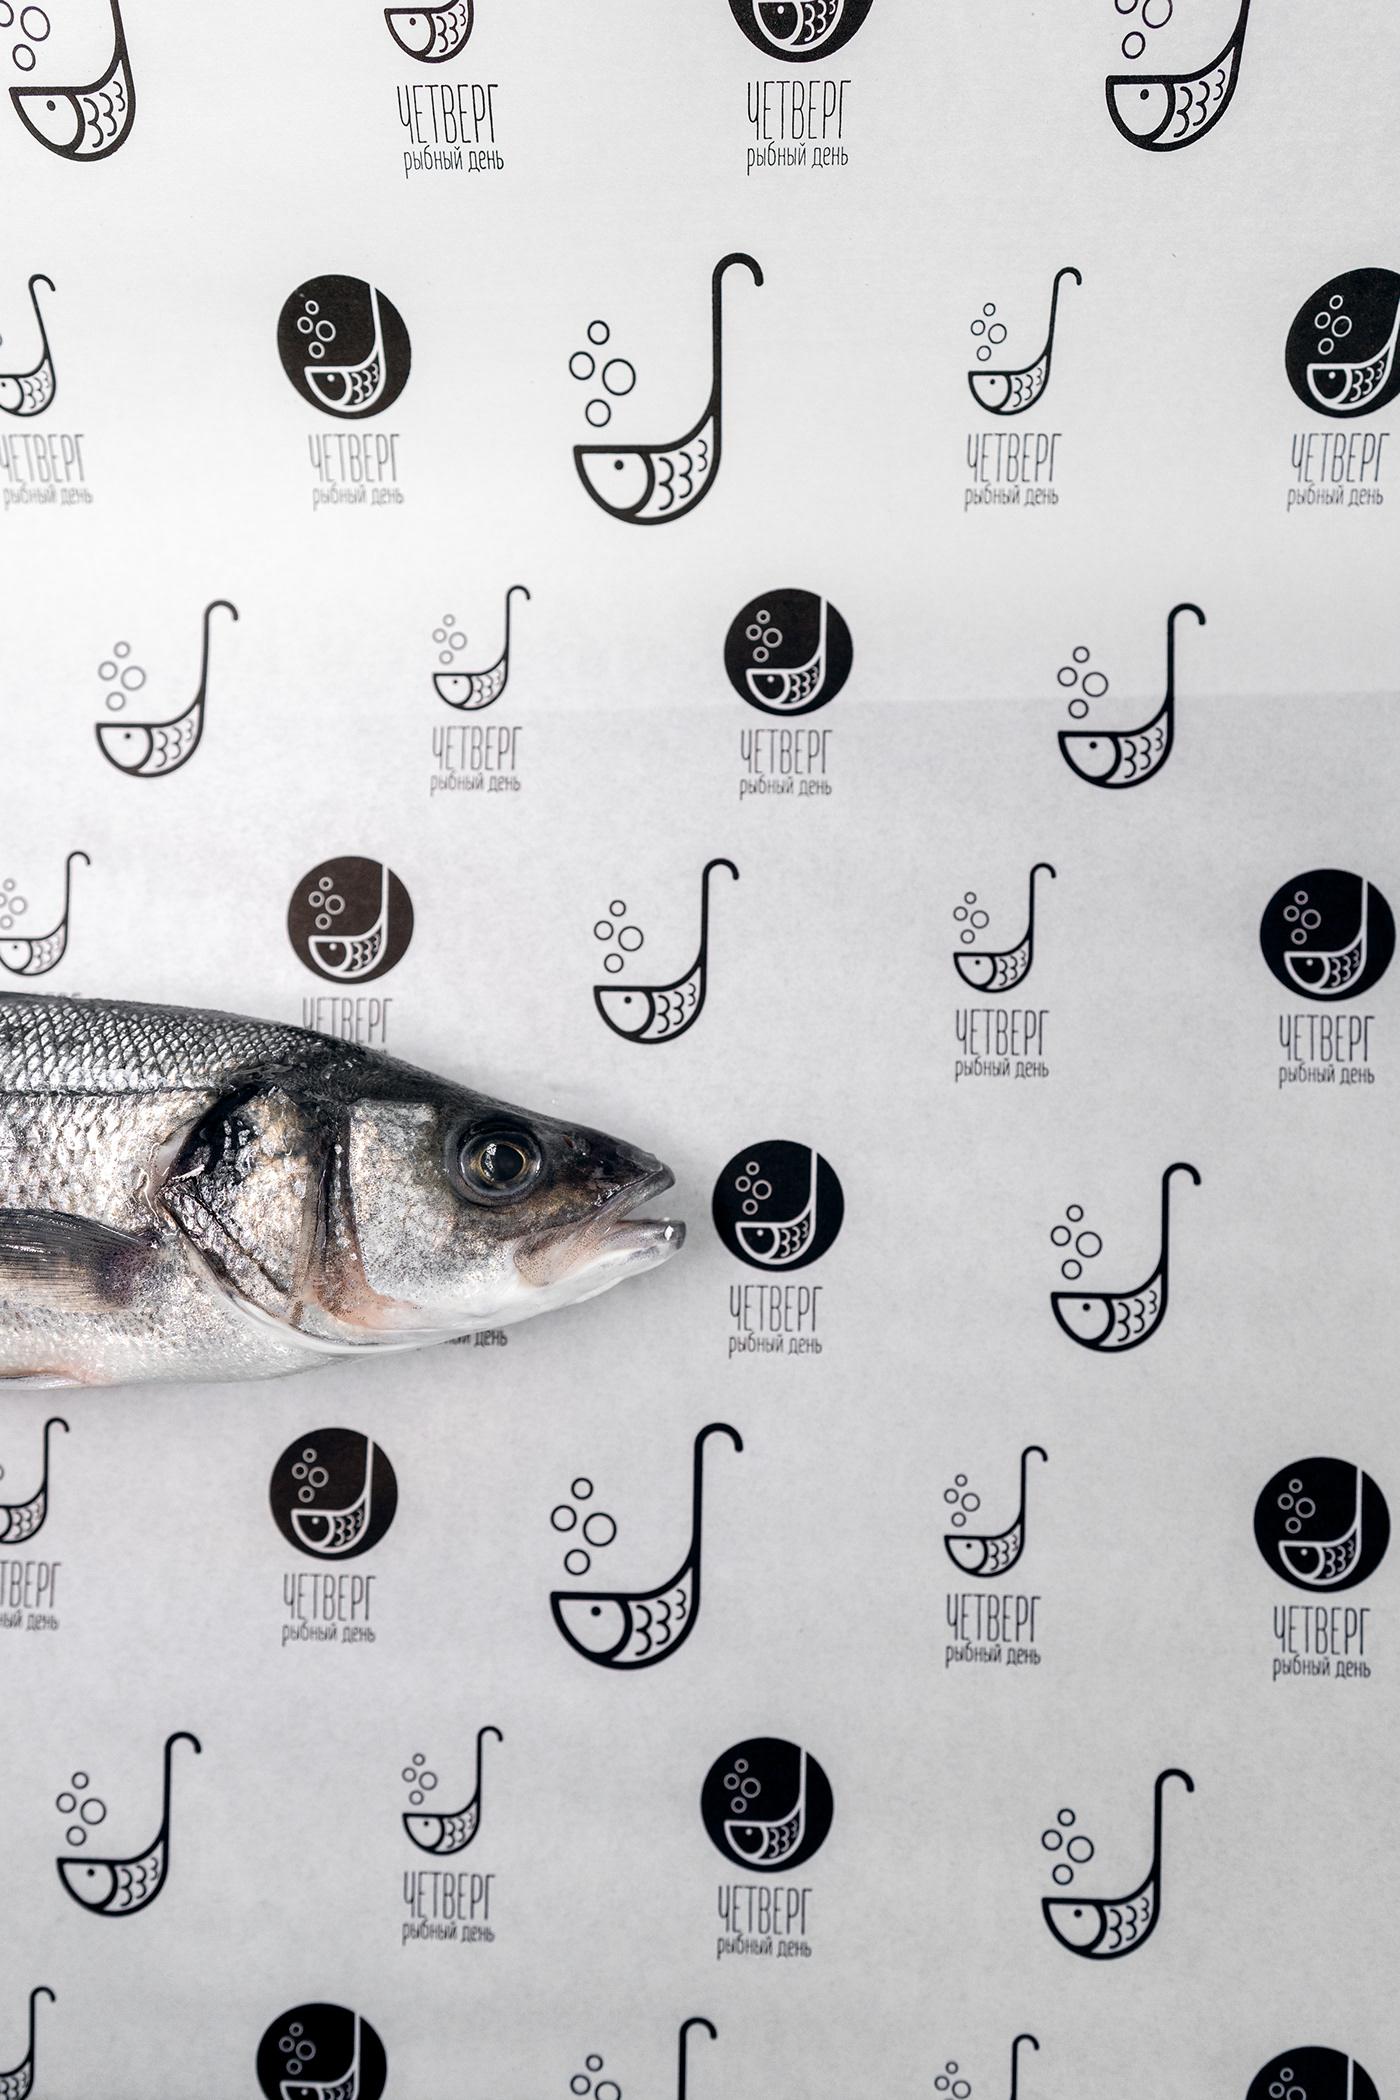 brand branding  fish Icon logo Logotype seafood shop store